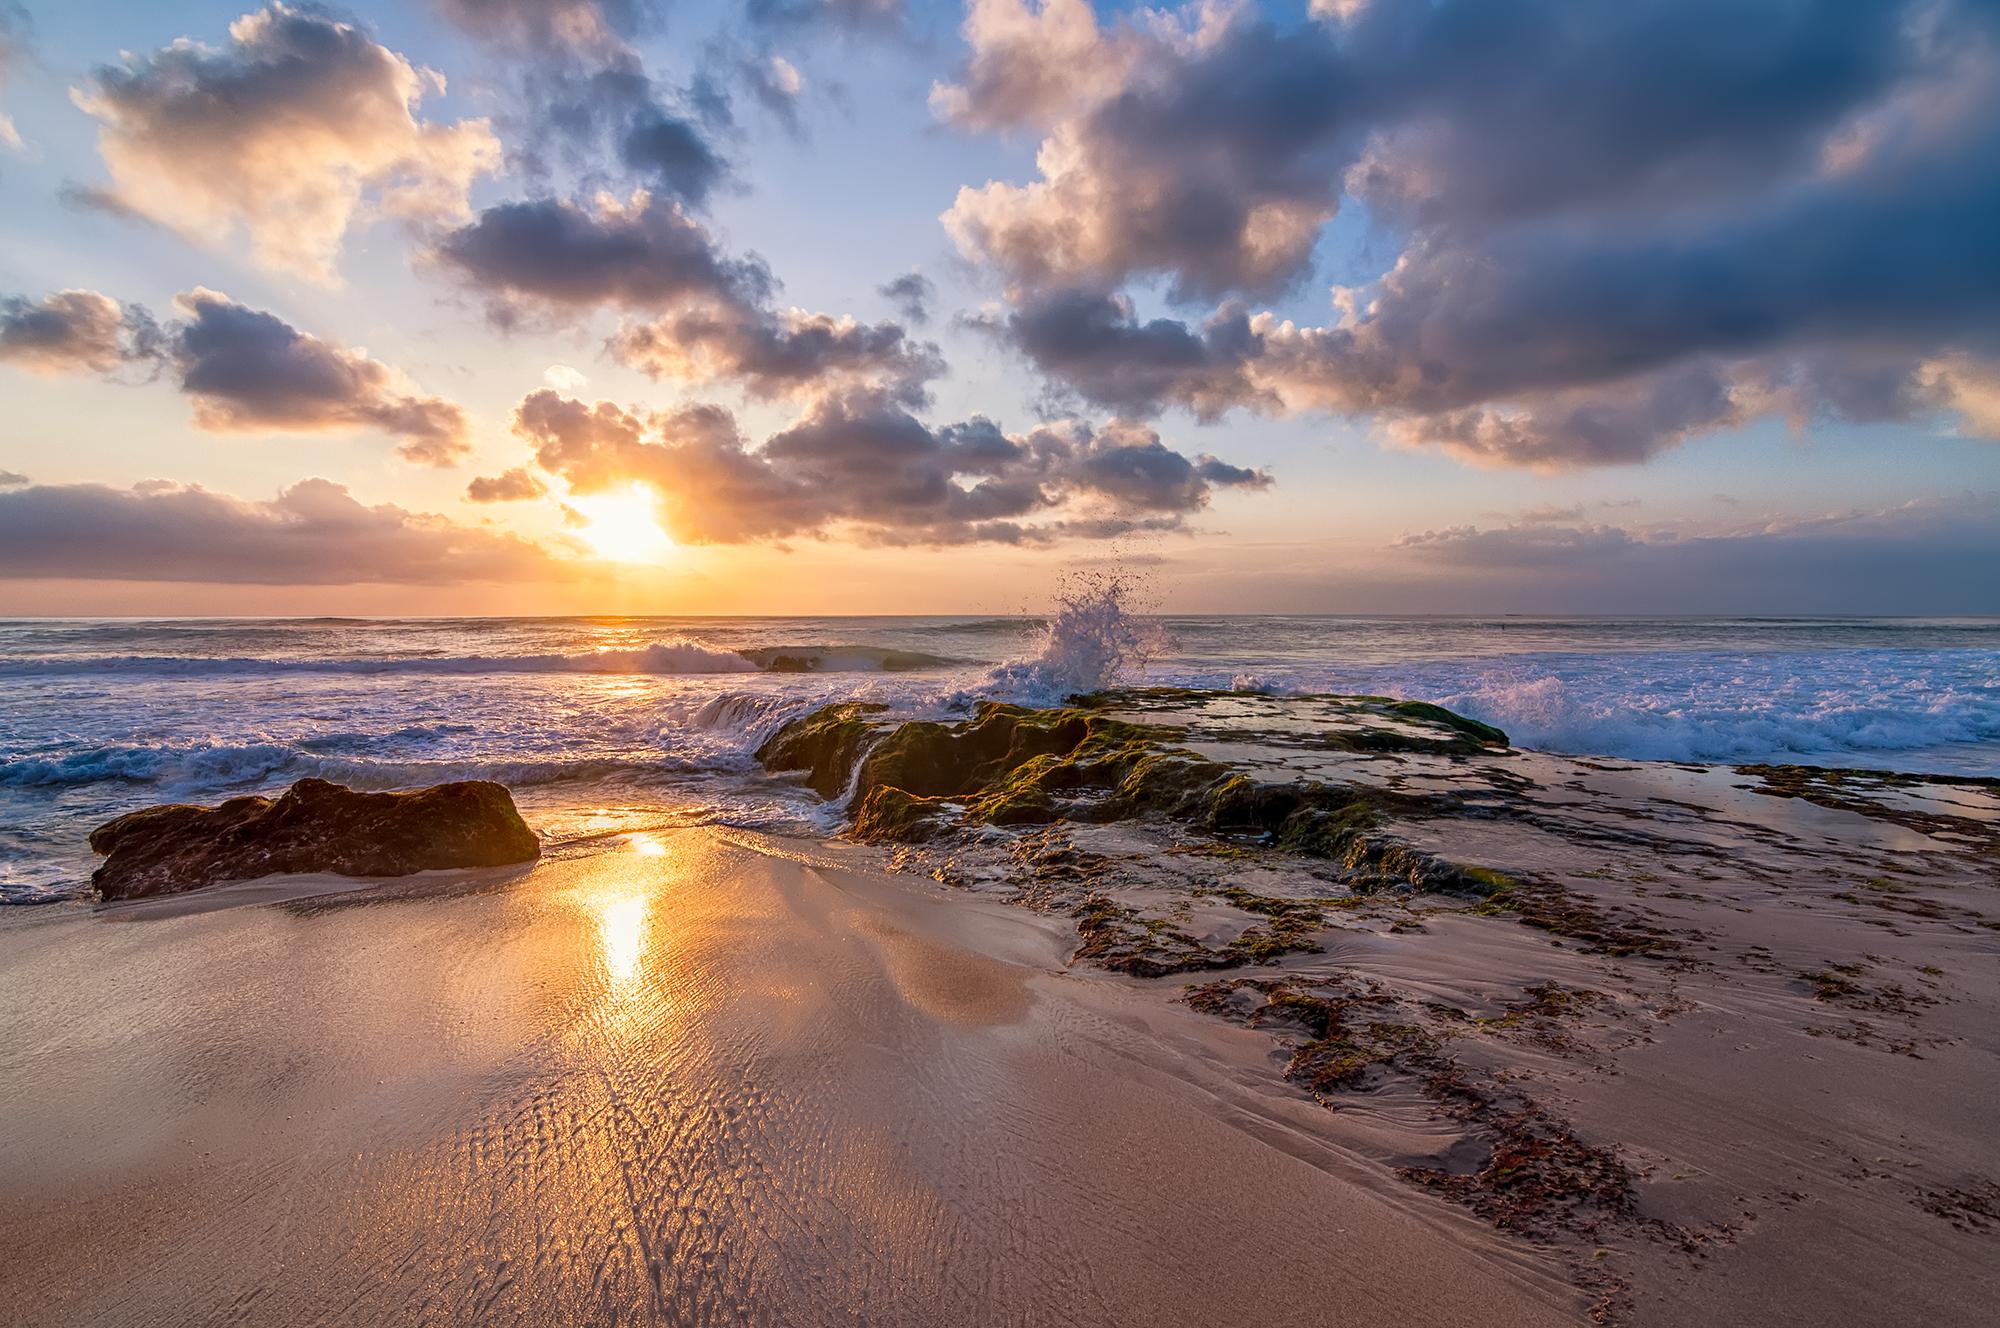 dreamland-beach-in-bali_havasi_dorka_blog.jpg